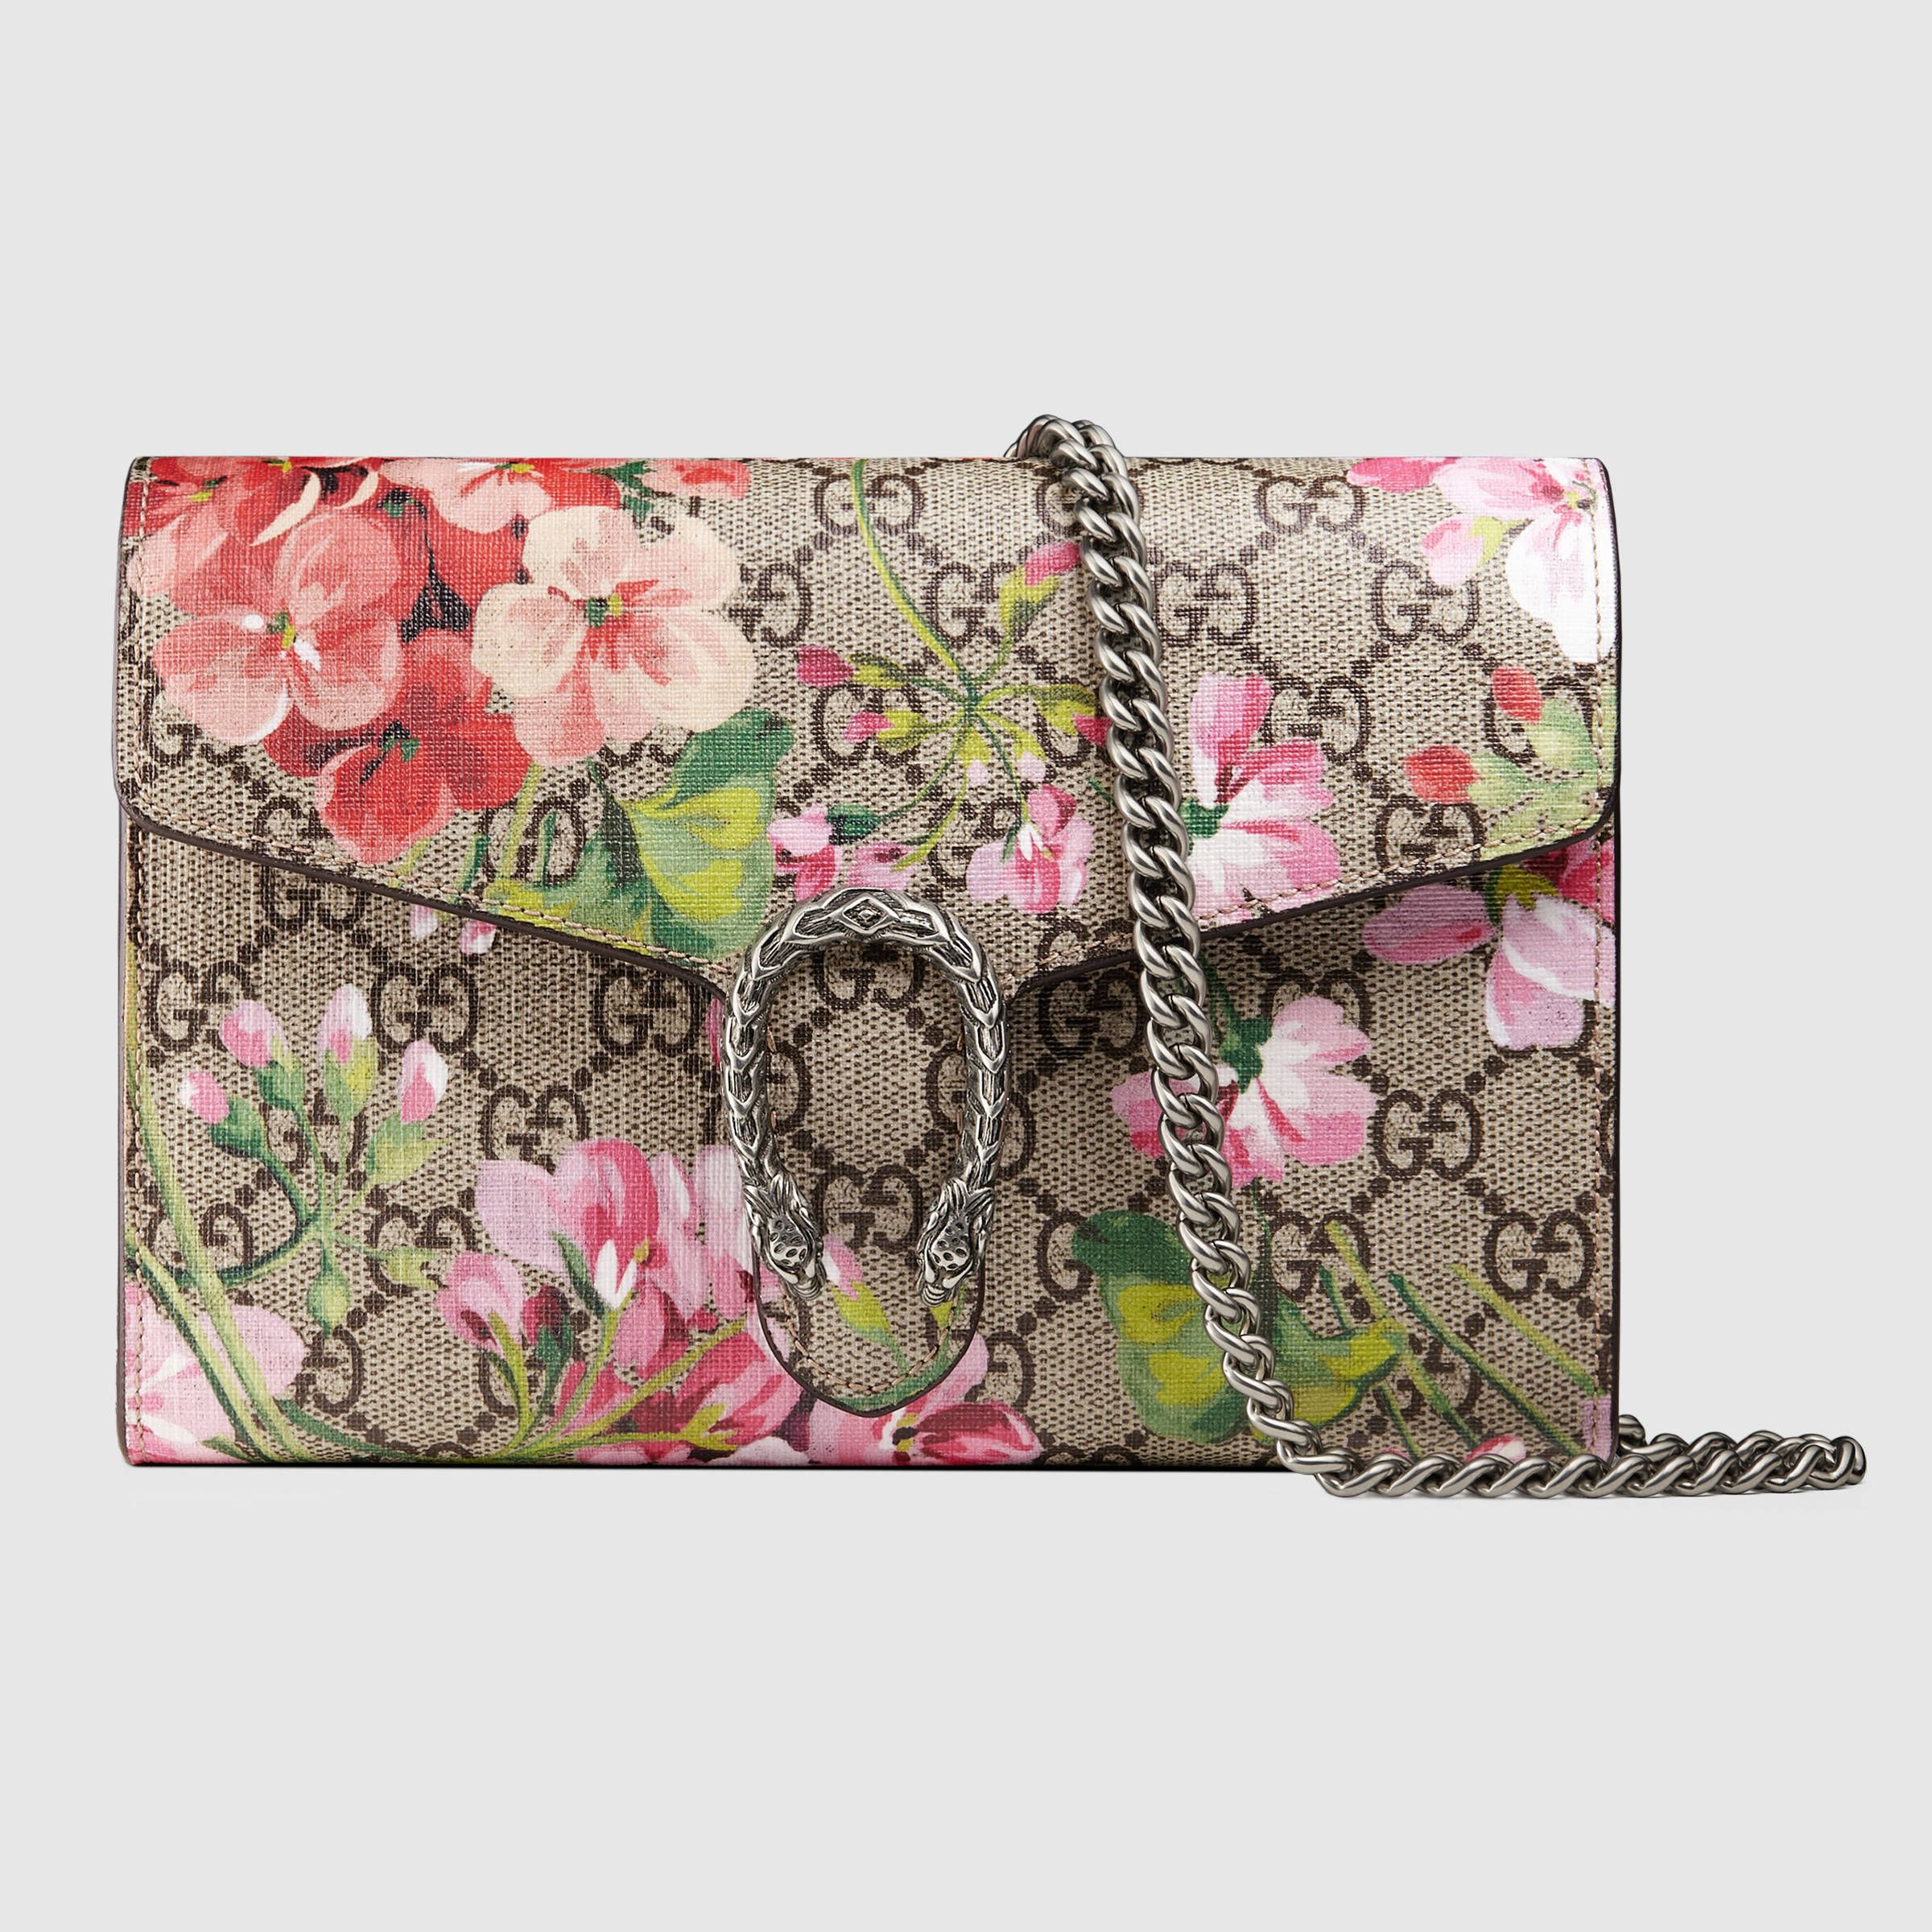 ccdb6dd62dd2 Dionysus Blooms print mini chain bag | My... Gift List! | Gucci ...